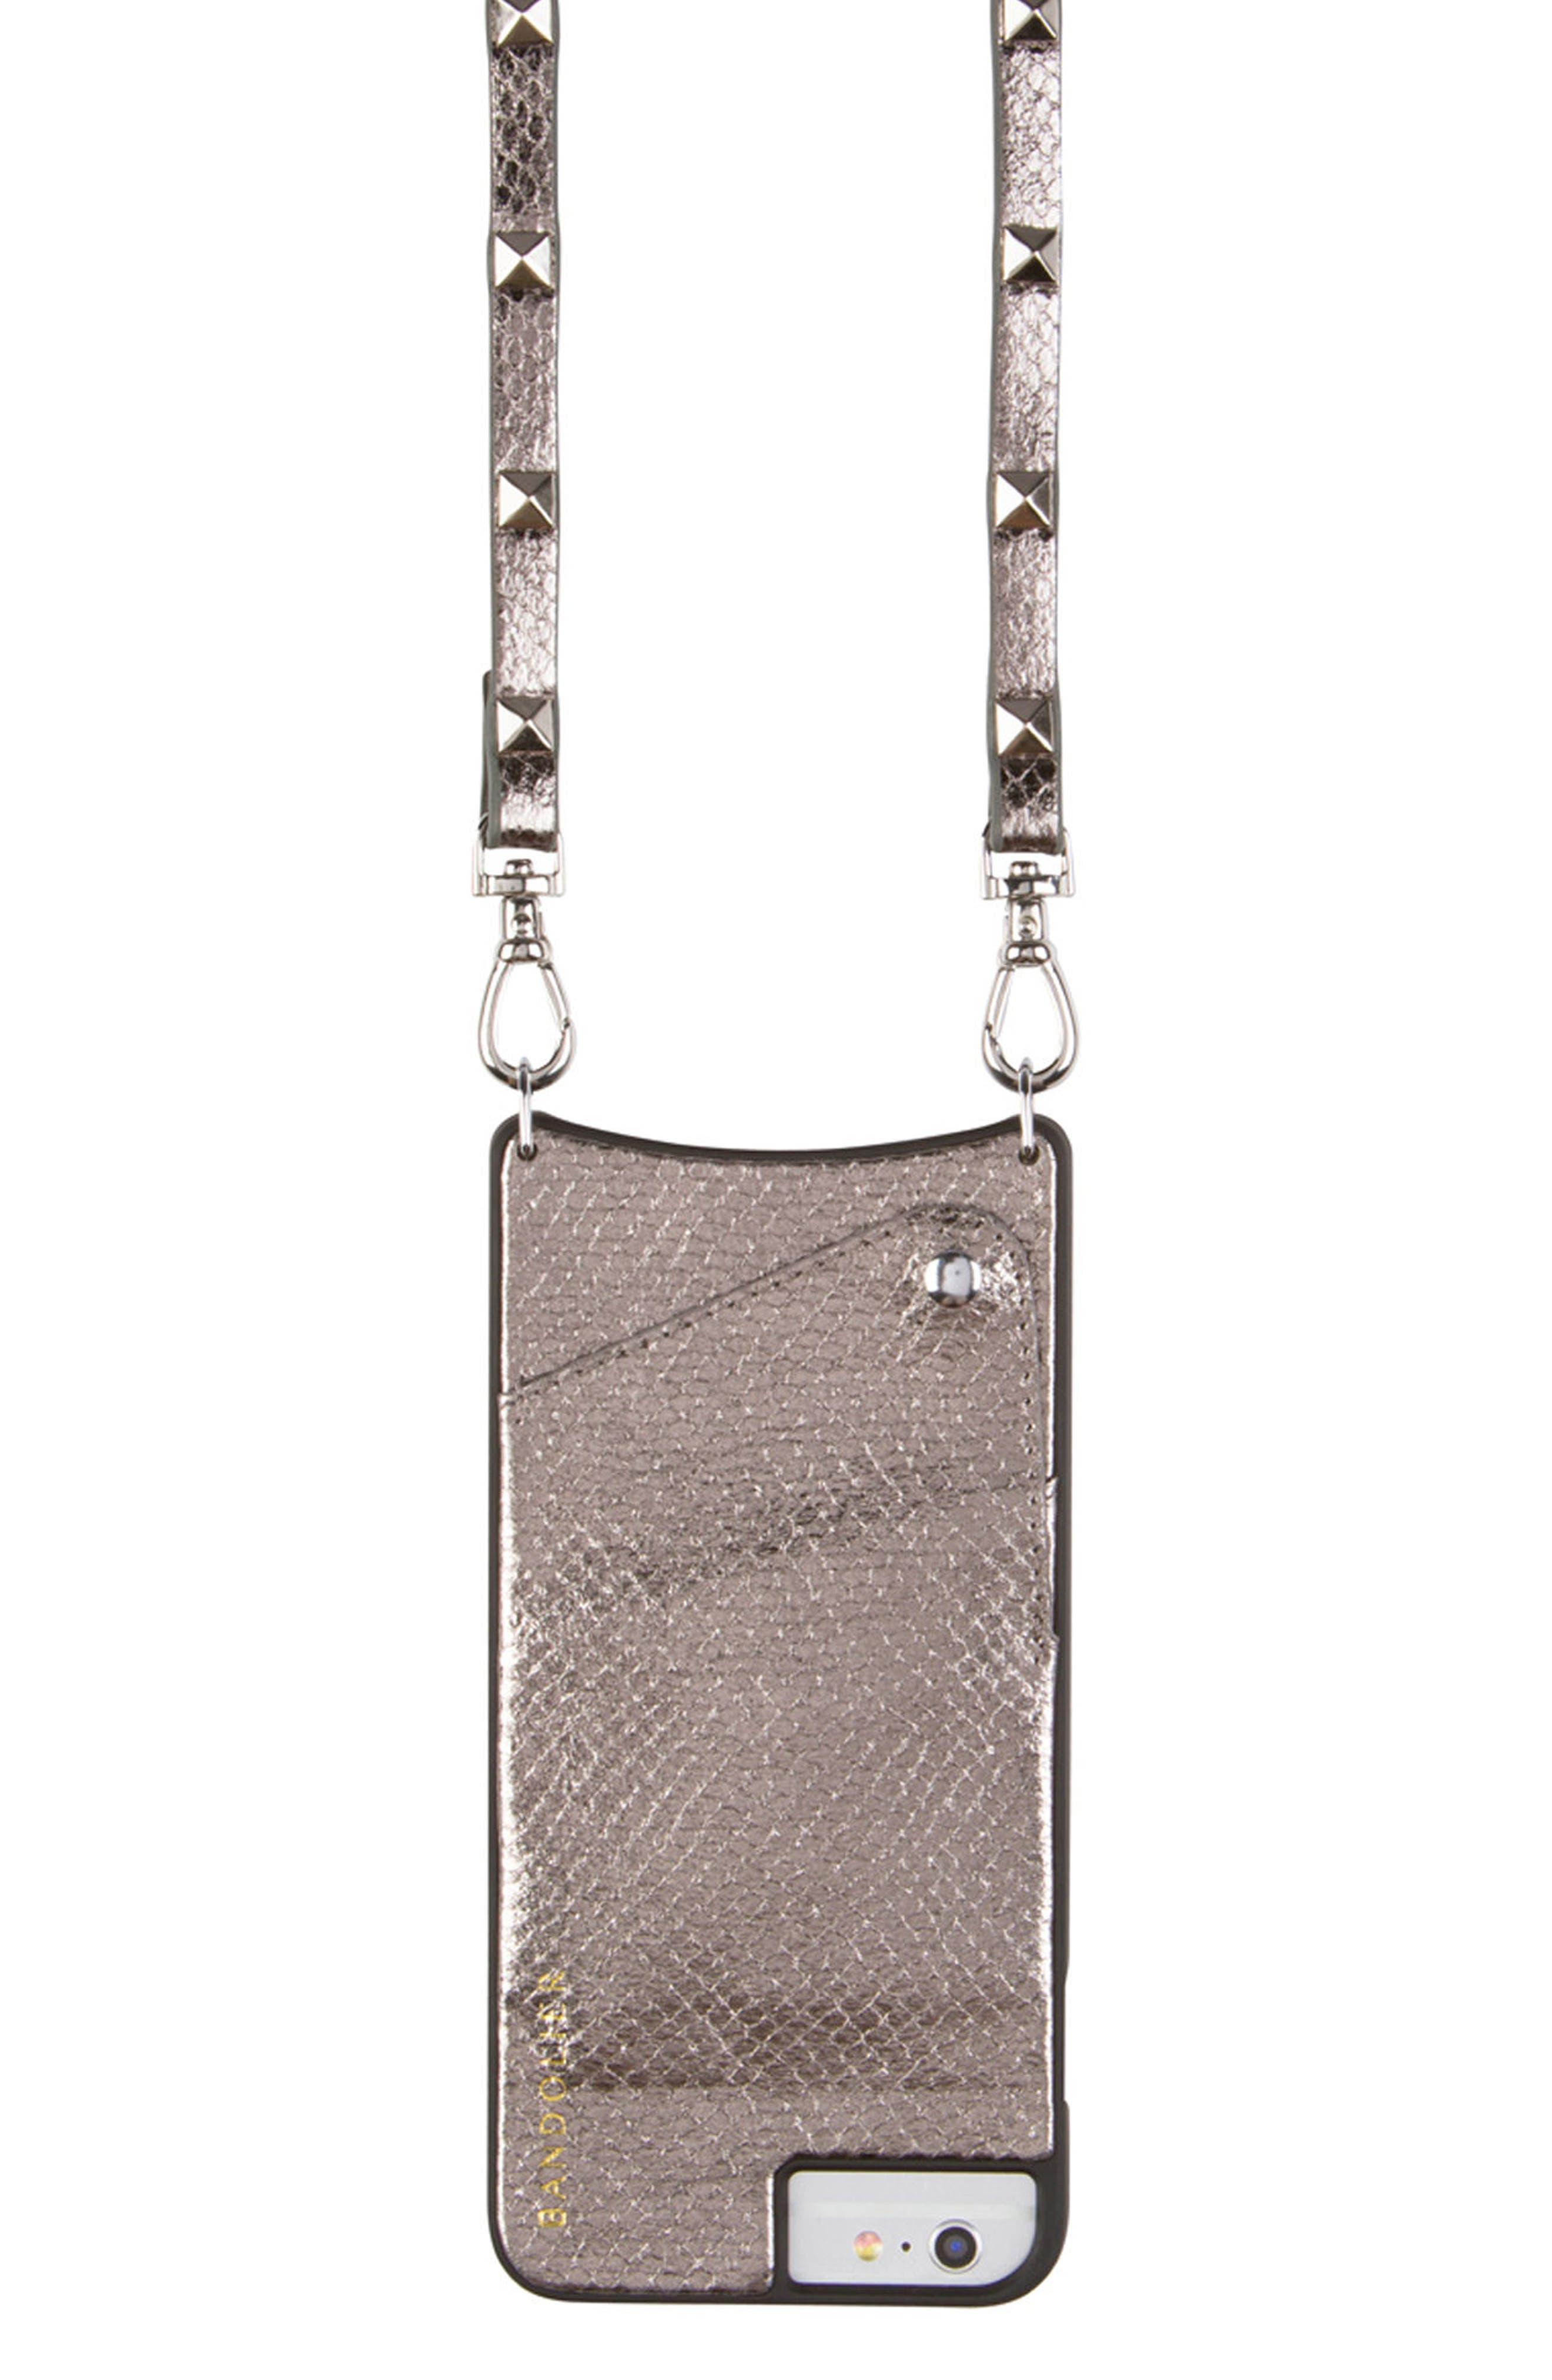 Sarah Metallic Faux Snakeskin iPhone 6/7/8 & 6/7/8 Plus Crossbody Case,                             Main thumbnail 1, color,                             040